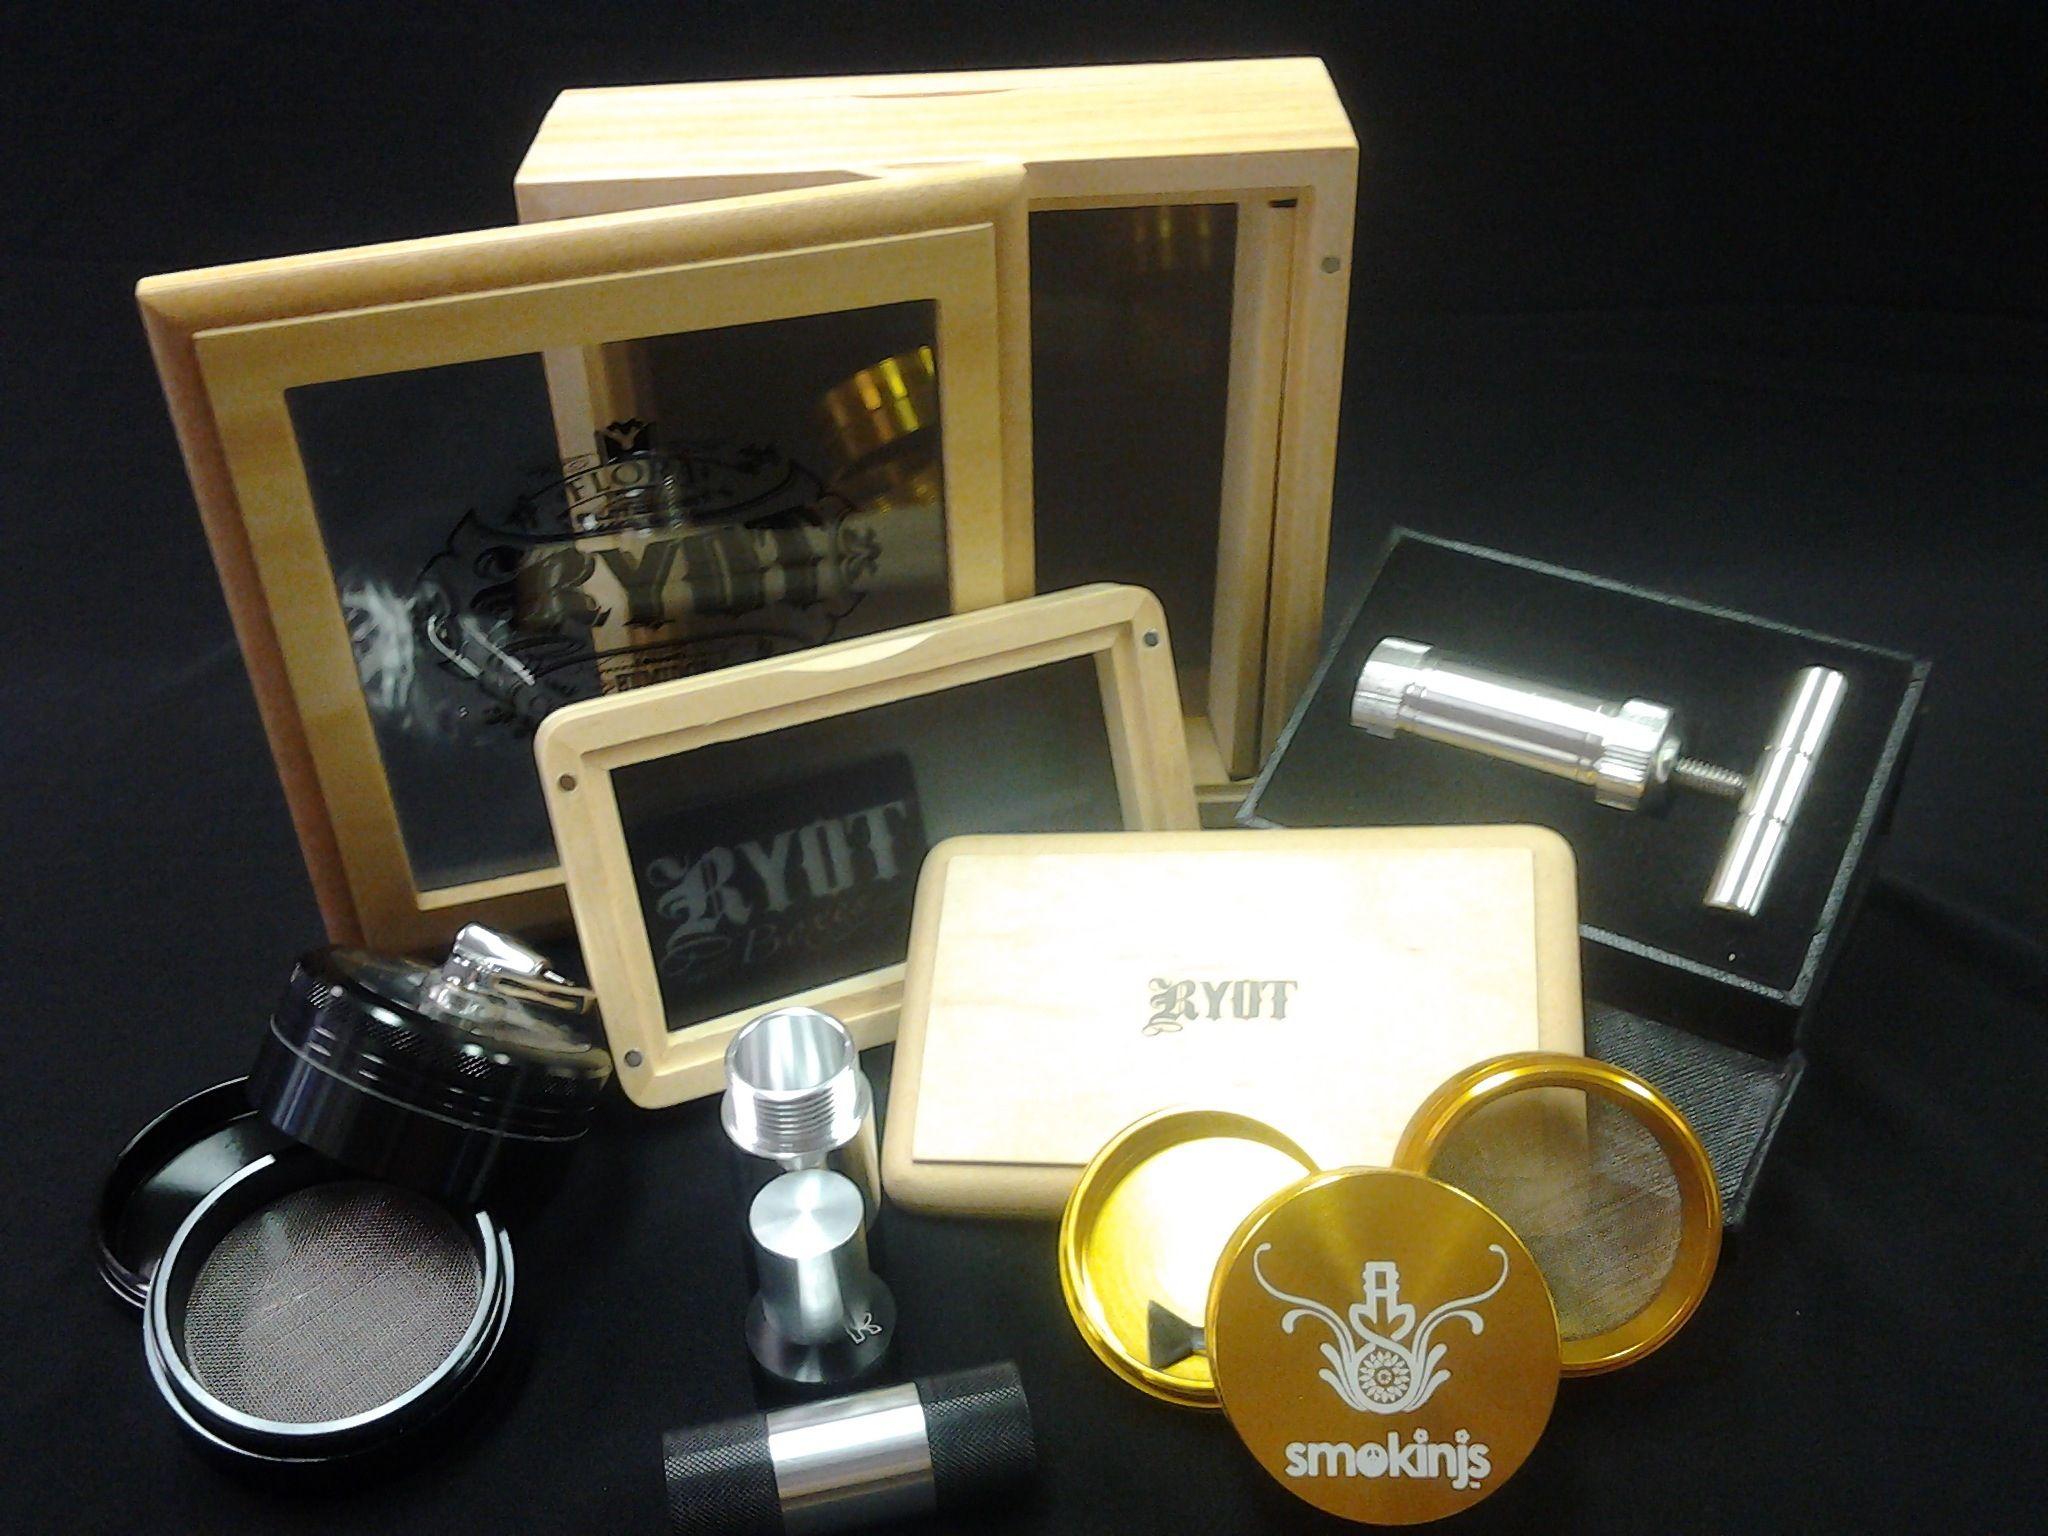 Dream grinder kief set cool gifts herb storage